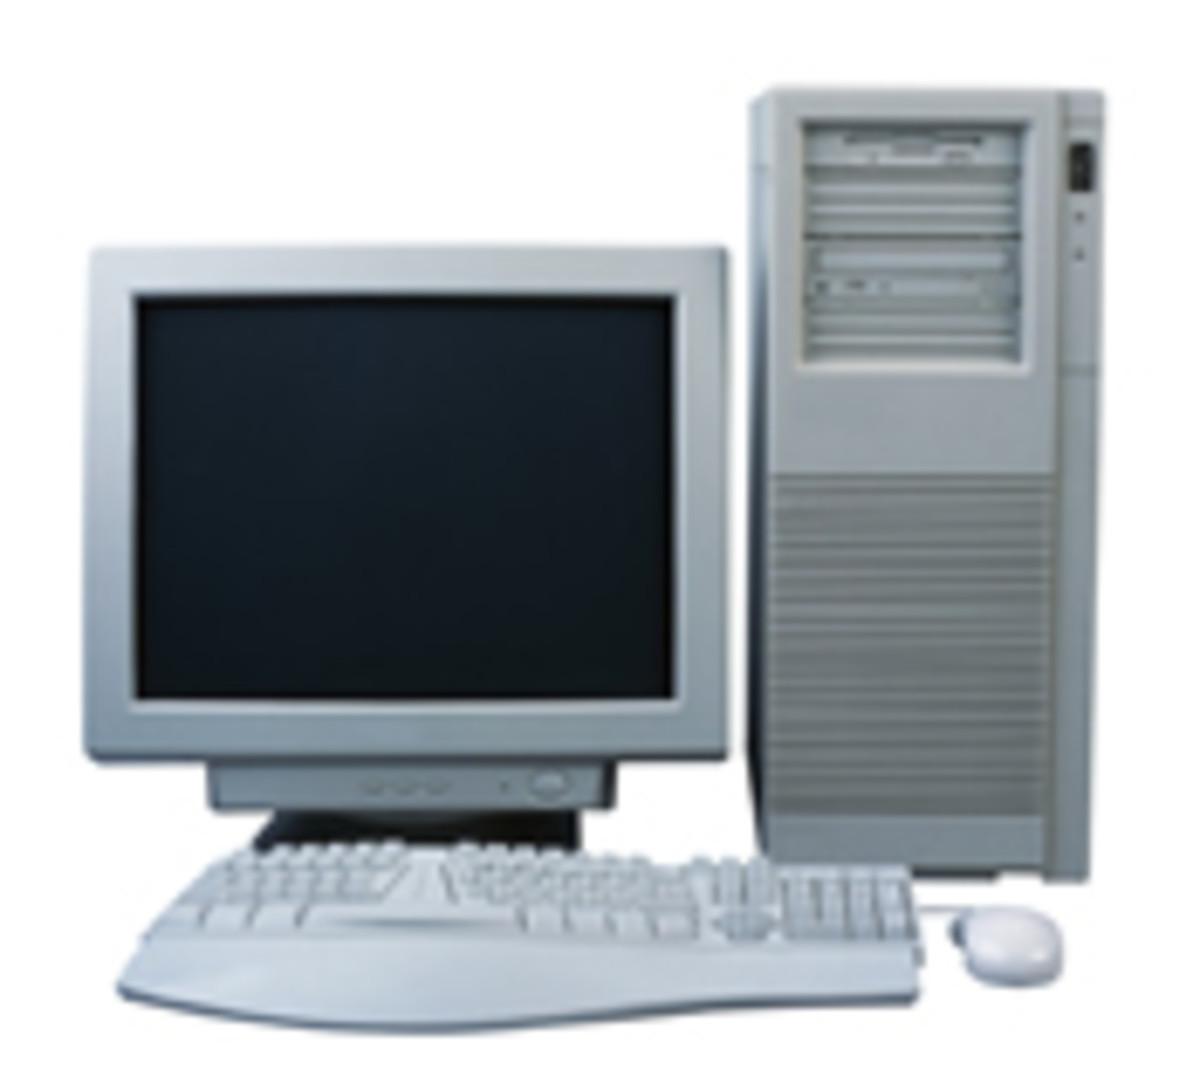 A basic computer